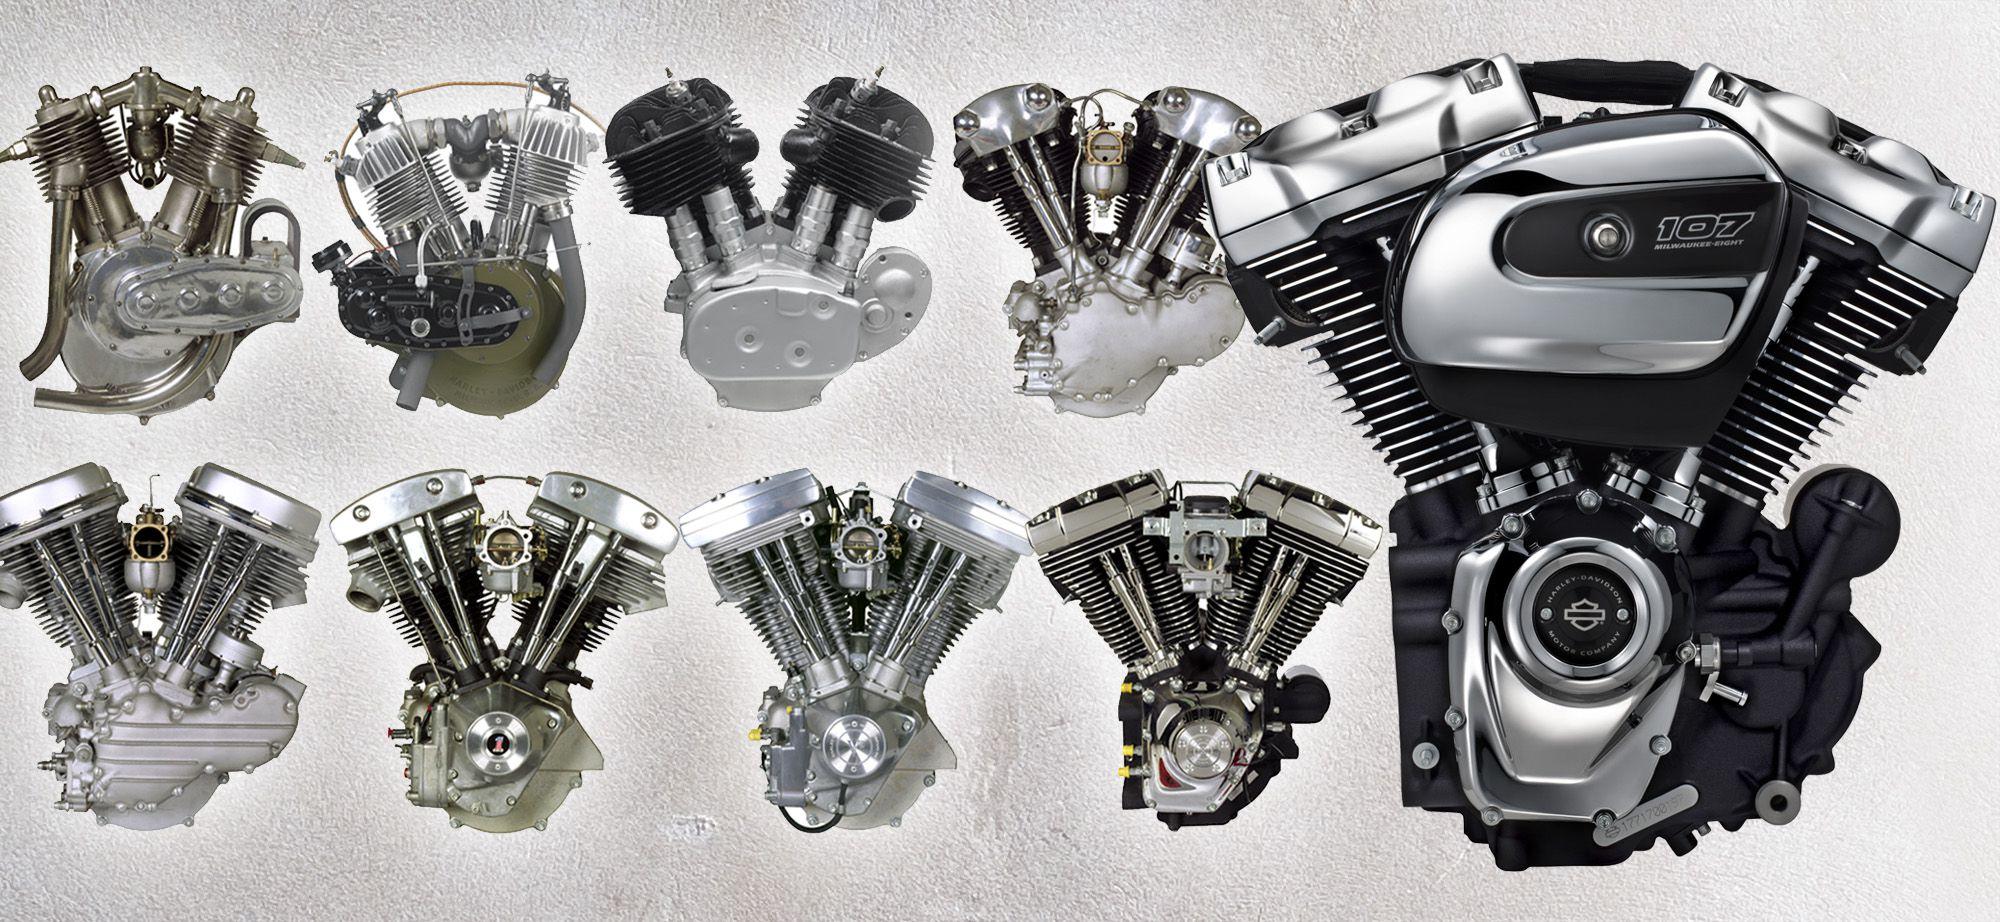 Screamin' Eagle Upgrade for the New Milwaukee-Eight Engine